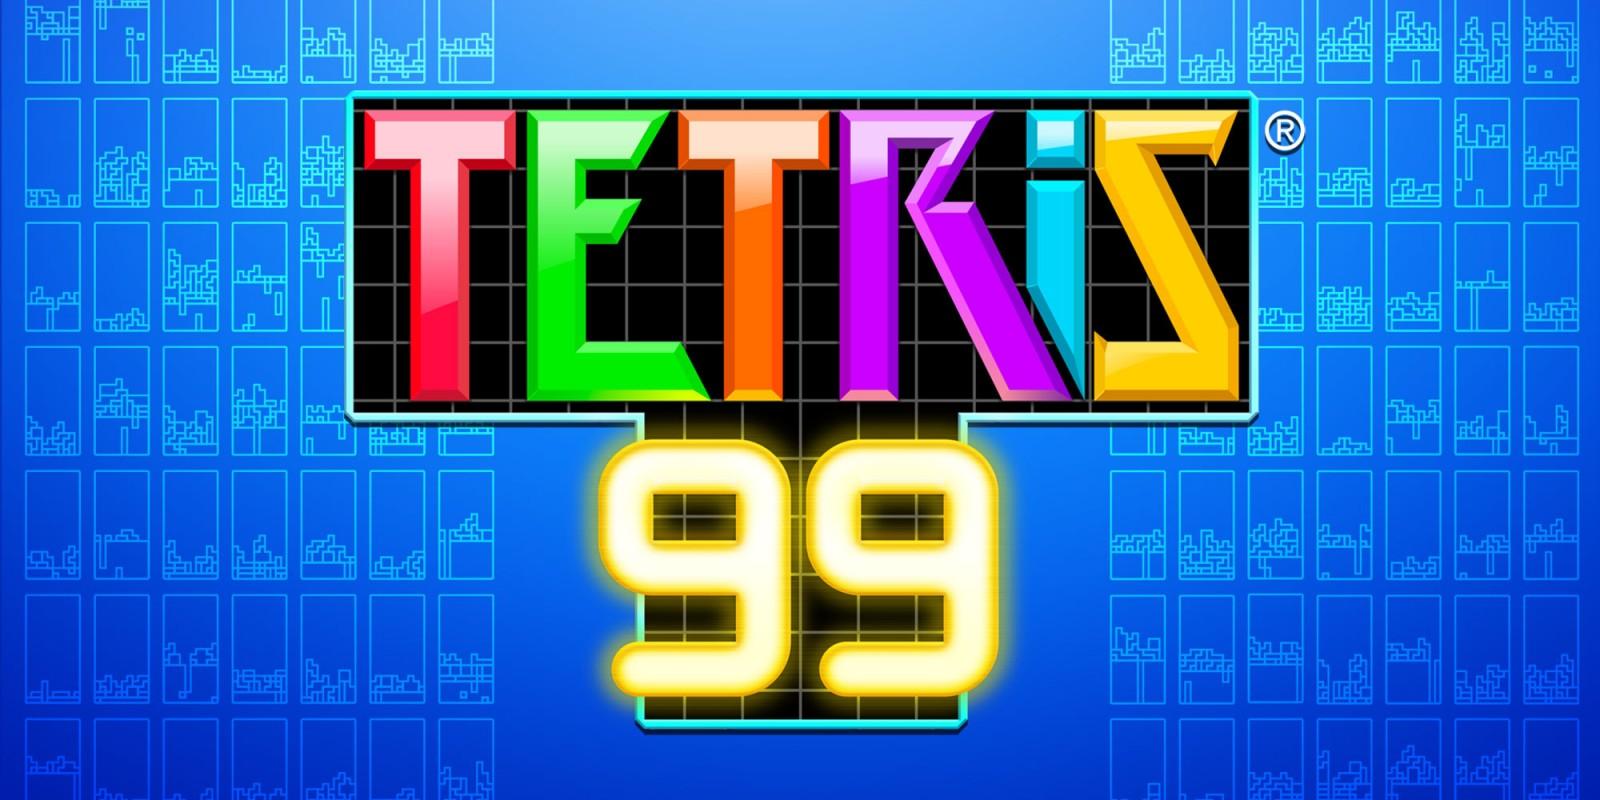 Tetris 99 Juego de Nintendo Switch Online